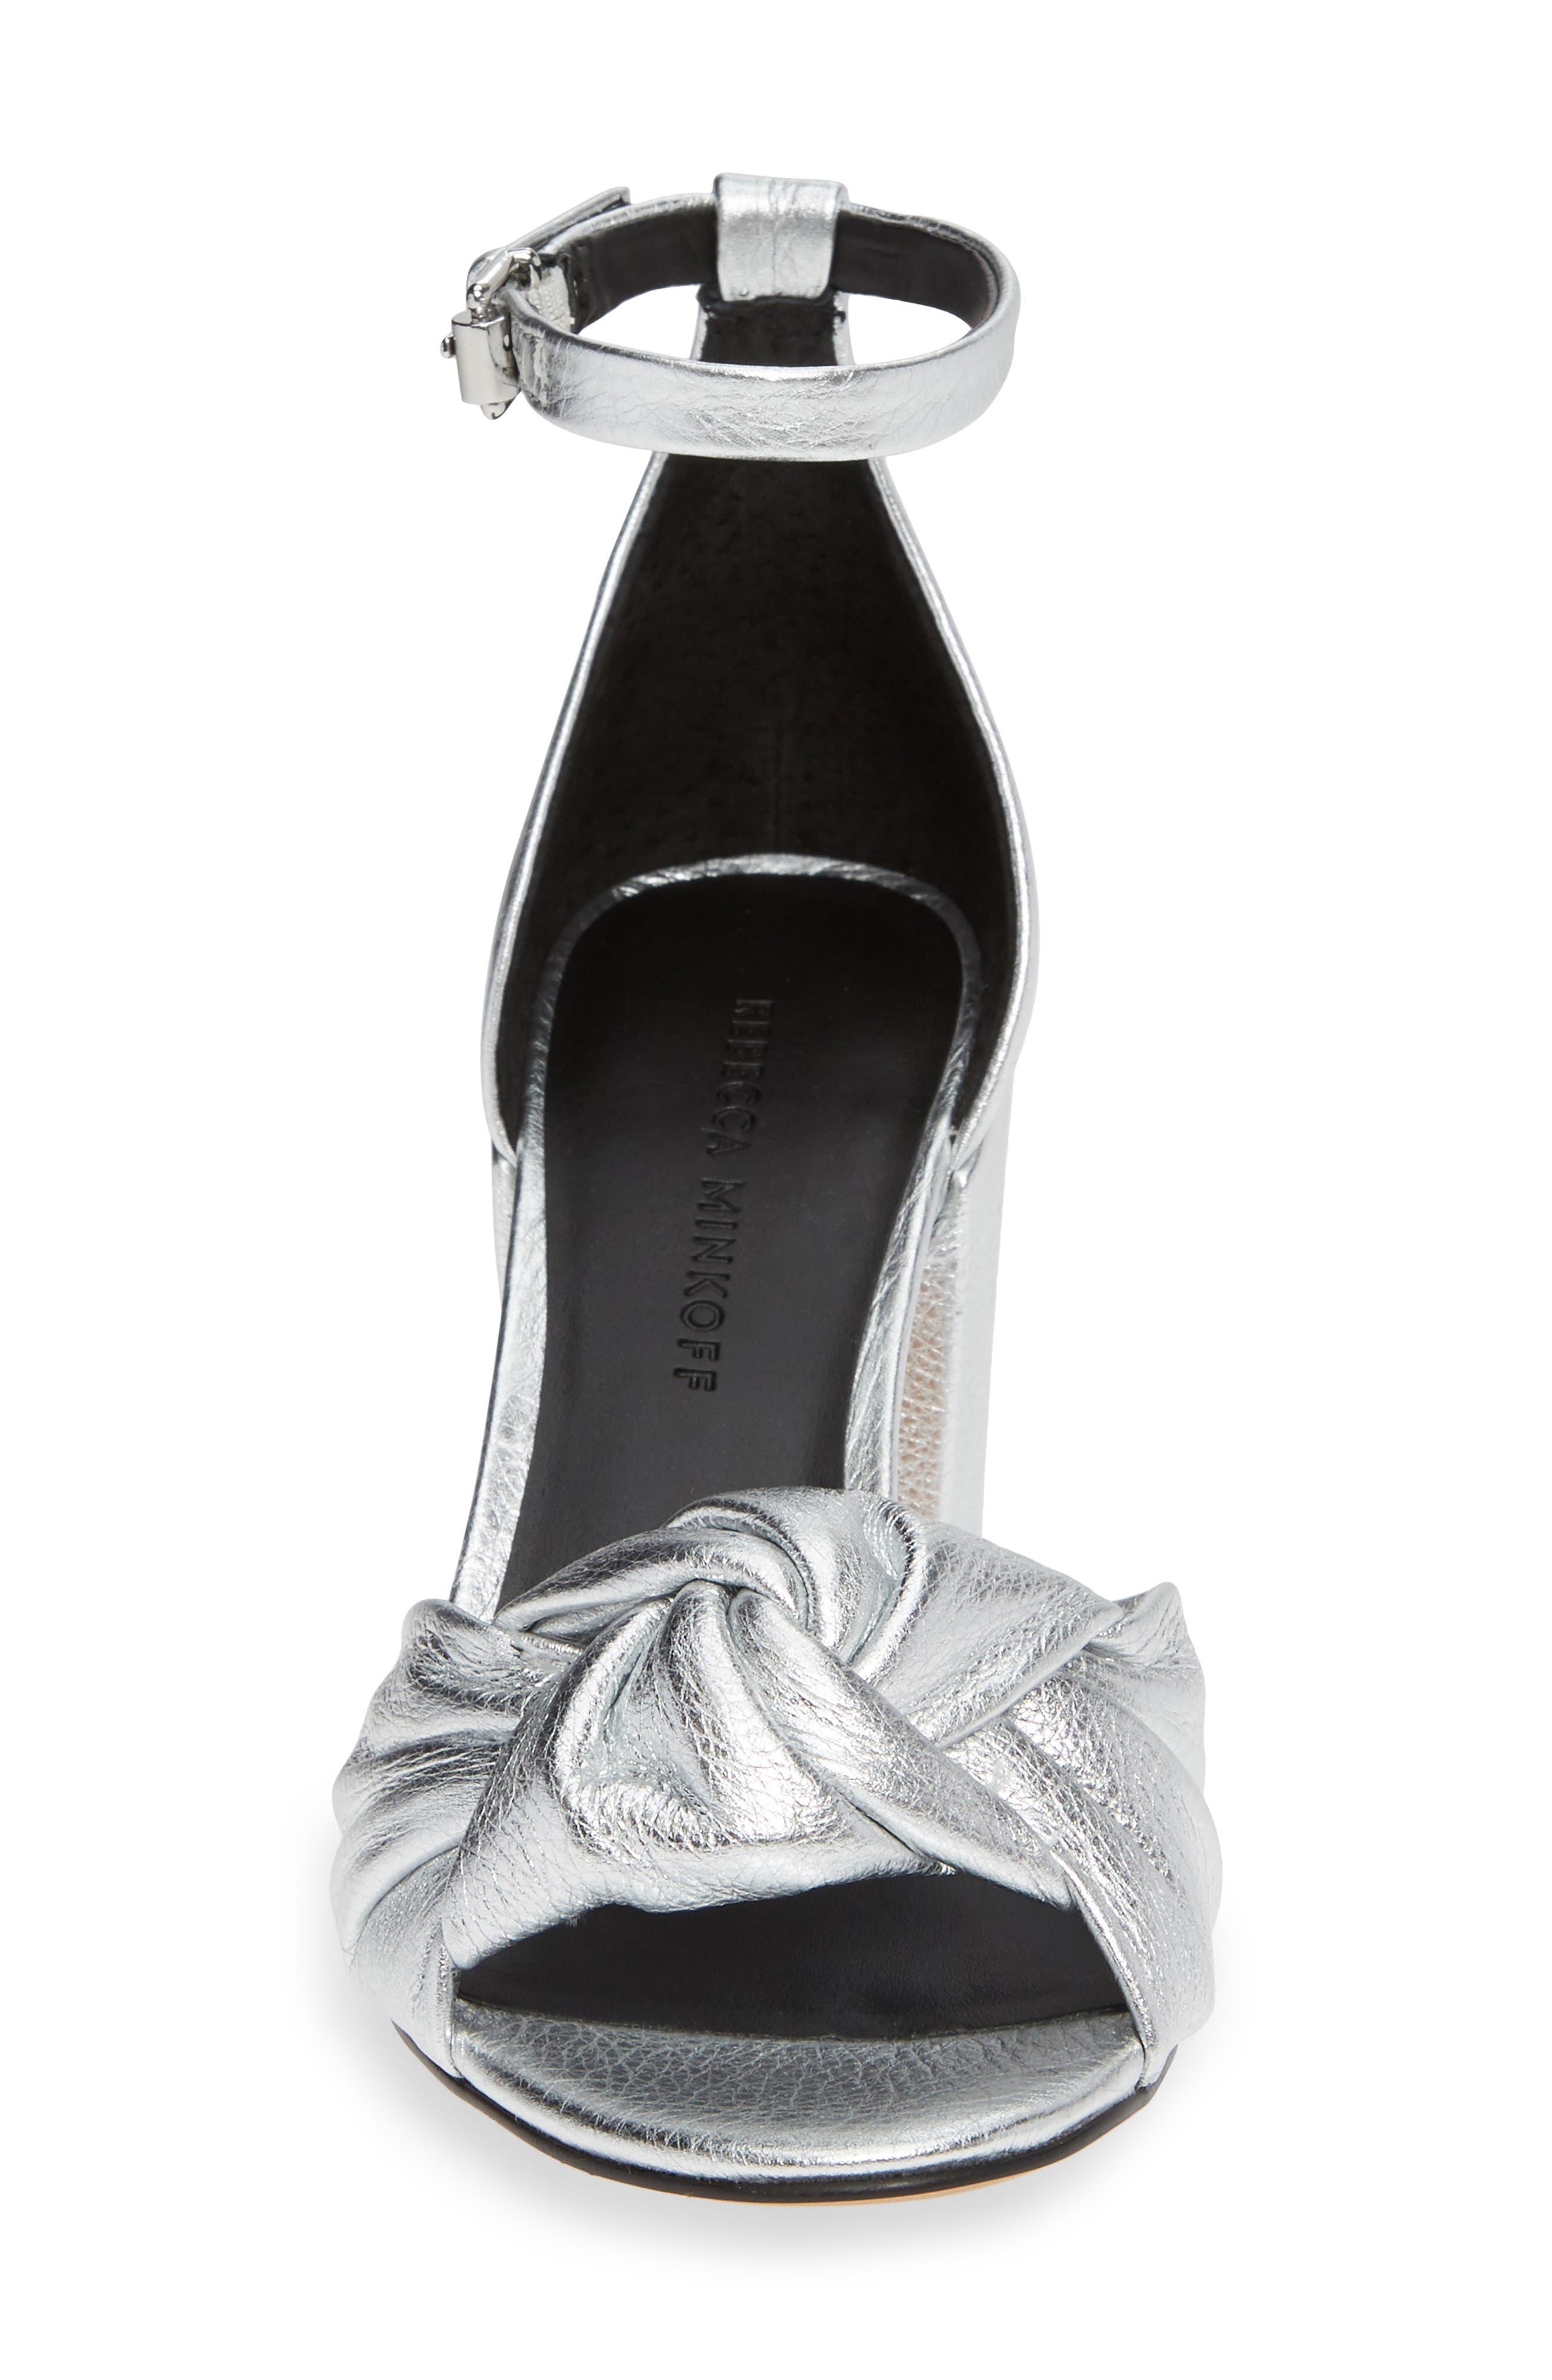 REBECCA MINKOFF, Capriana Ankle Strap Sandal, Alternate thumbnail 4, color, SILVER LEATHER